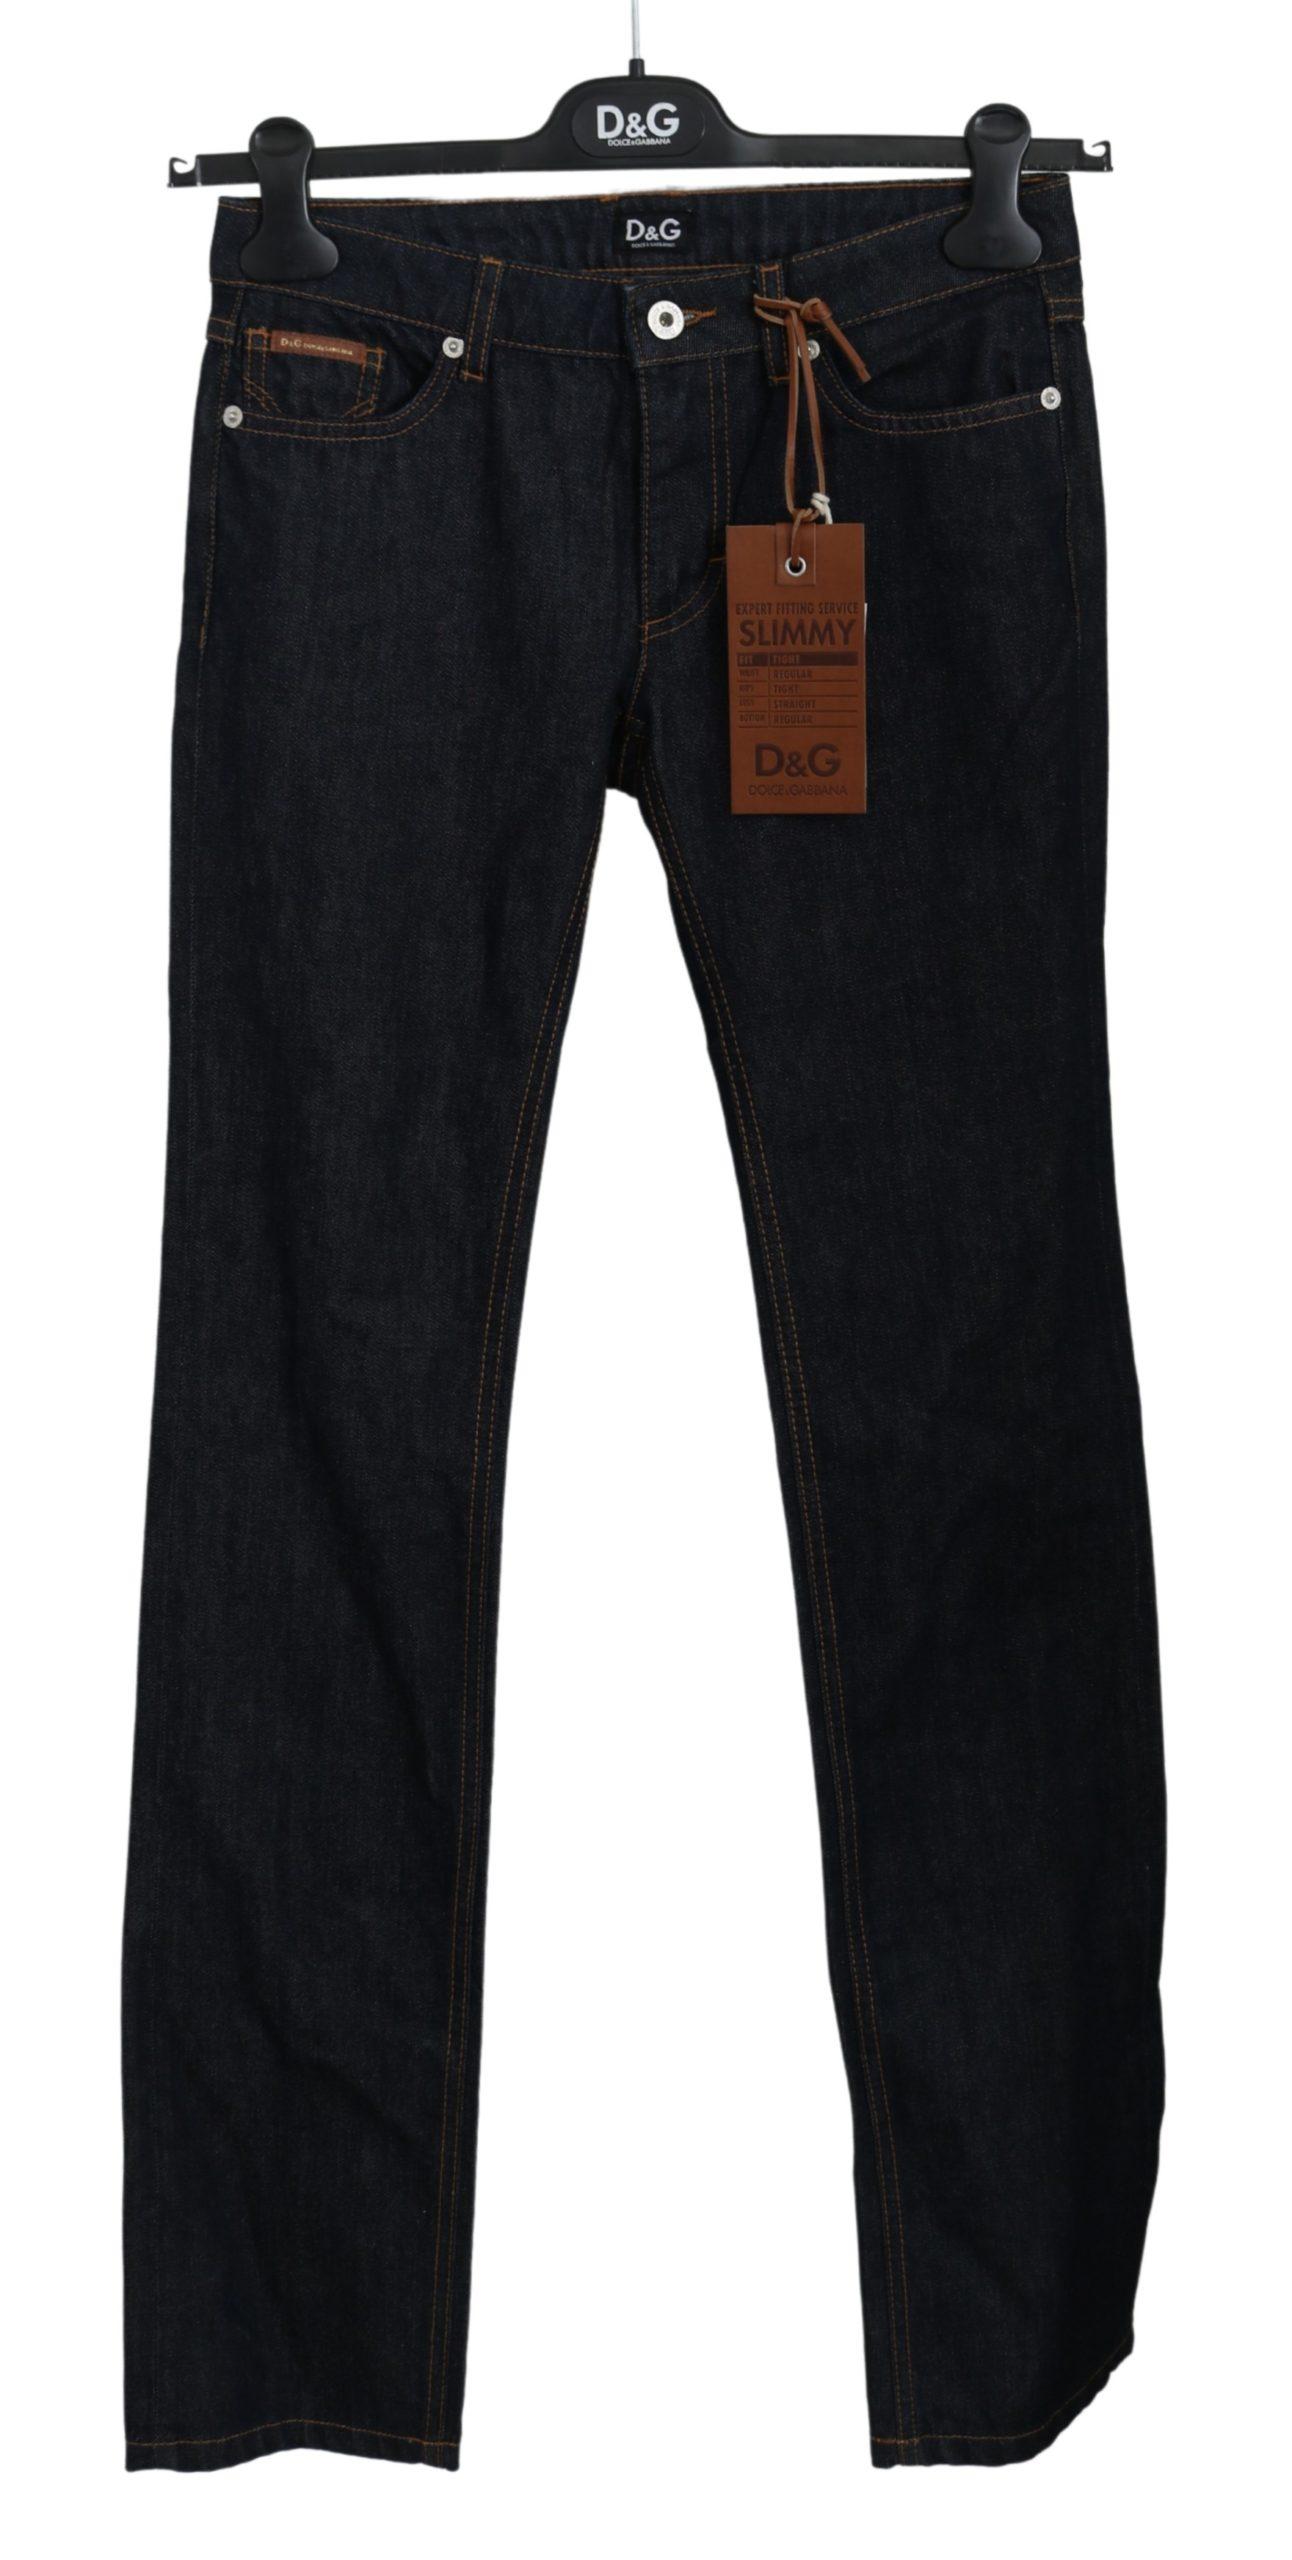 Dolce & Gabbana Women's SLIMMY Tight Cotton Jeans BYX1345 - W24